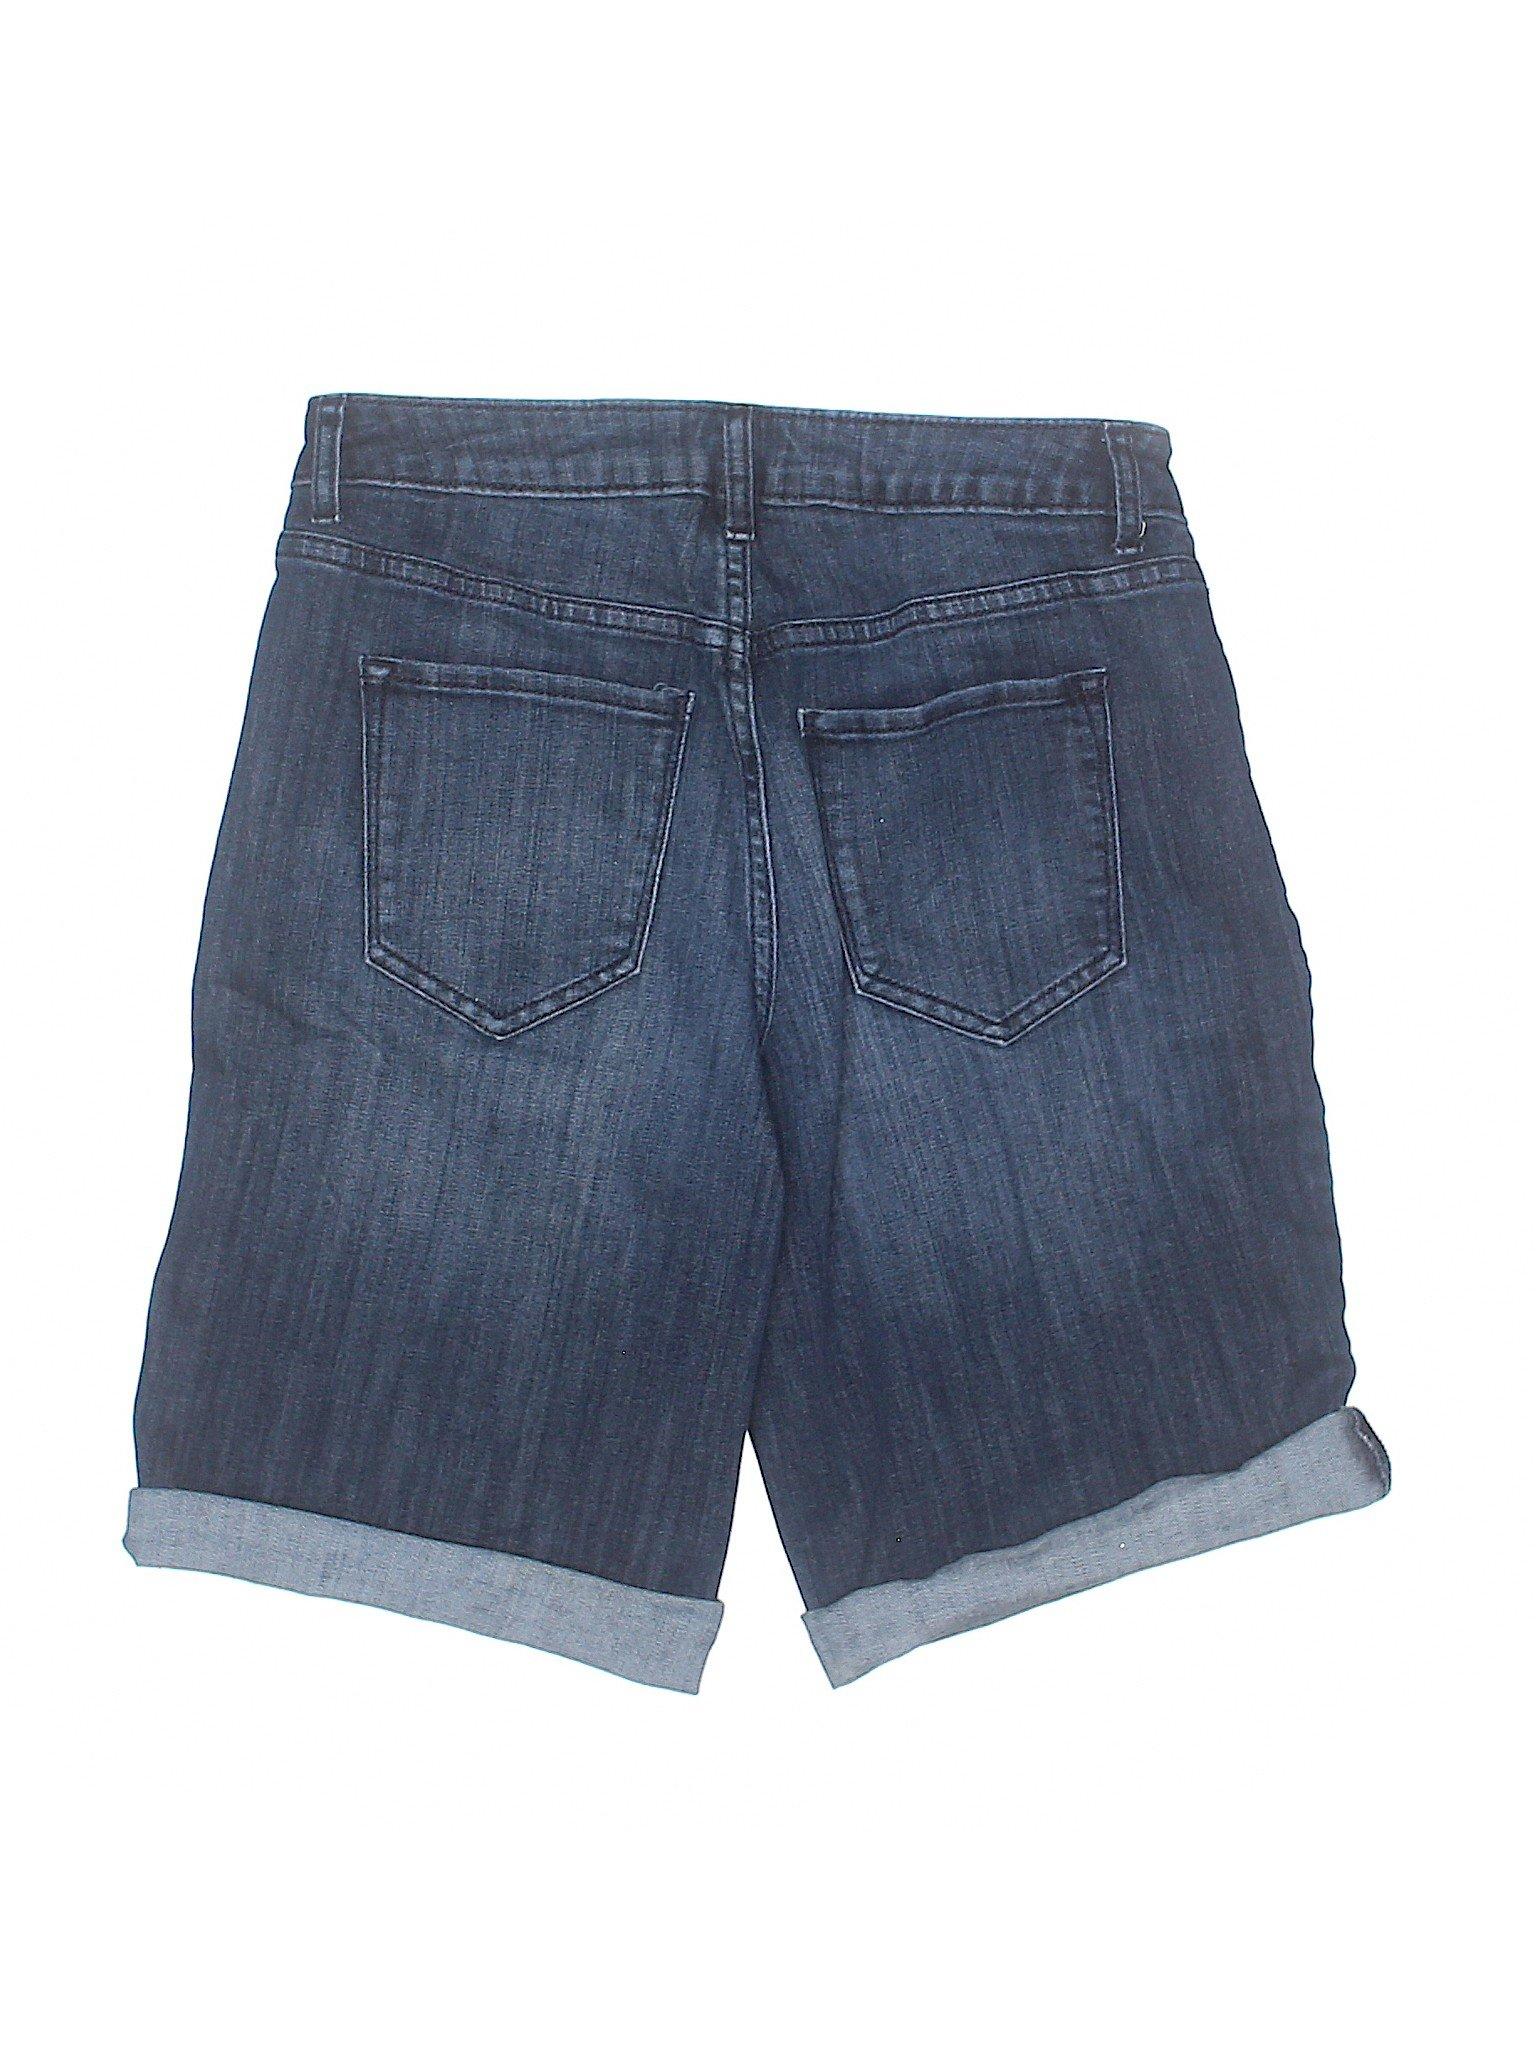 Vera Shorts Simply Denim Boutique Wang Vera wE0qag